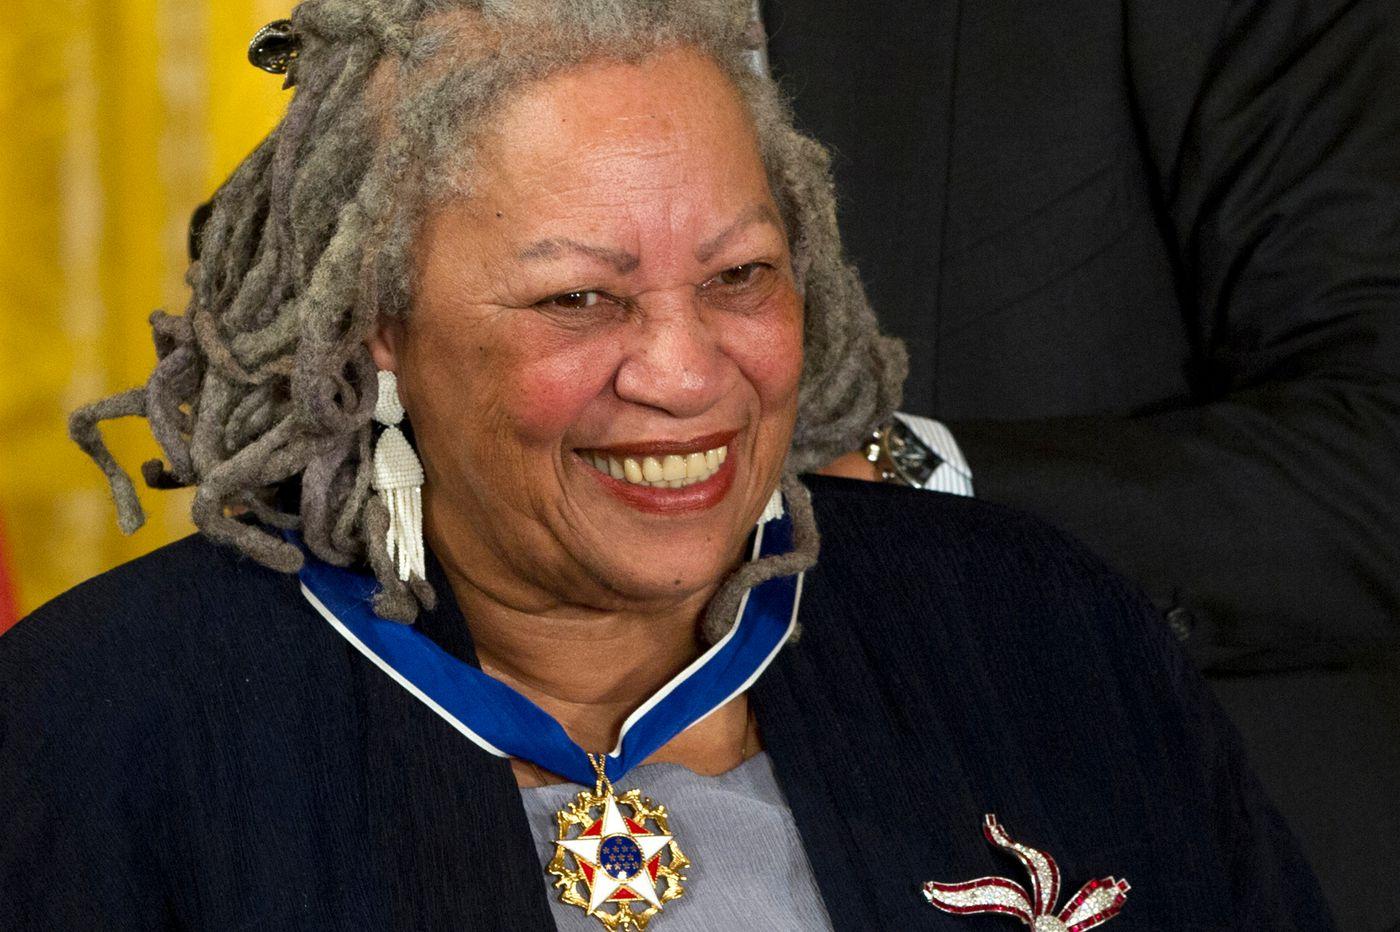 'A sense of spiritual stillness': Philly writers reflect on Toni Morrison's profound impact | Perspective